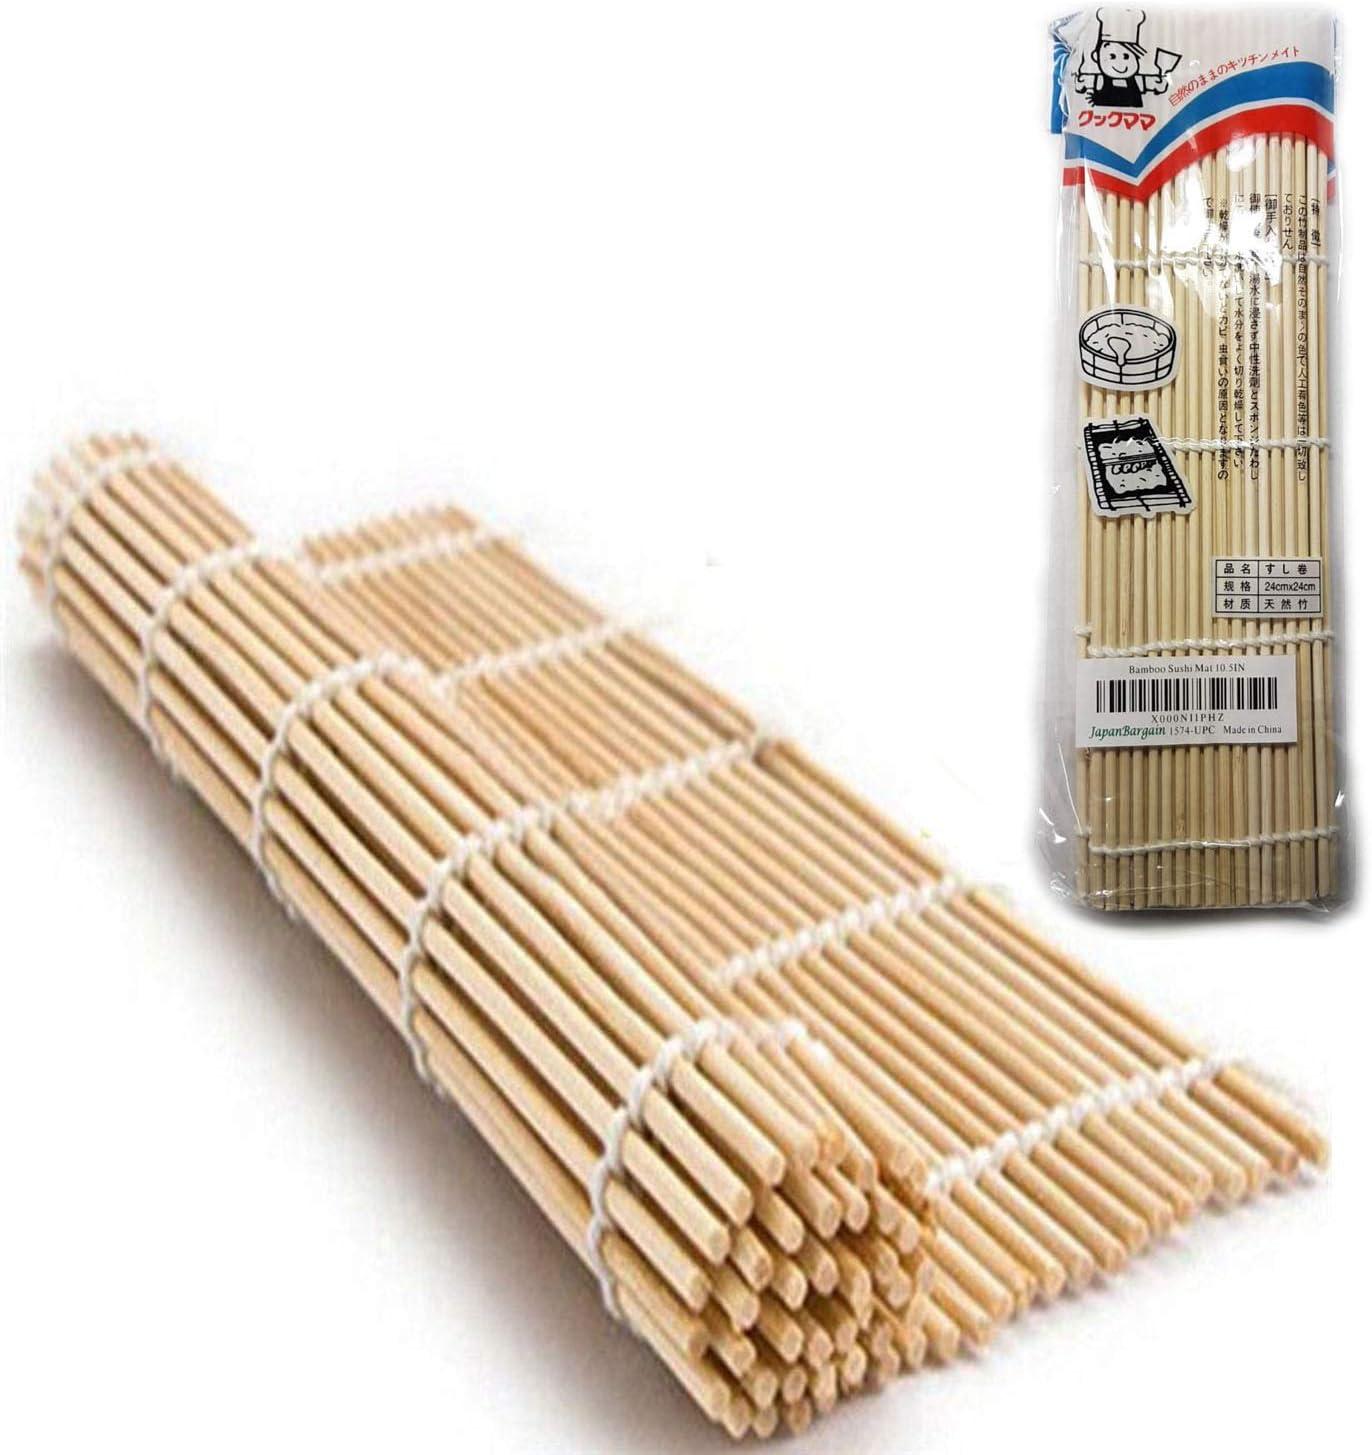 24x24cm UPKOCH 1 pieza Bamboo Sushi Roller Mat Square Premium Natural No t/óxico Rolling Sushi Rolling Bamboo Pad Fabricaci/ón de sushi Roller Sushi Making Tool